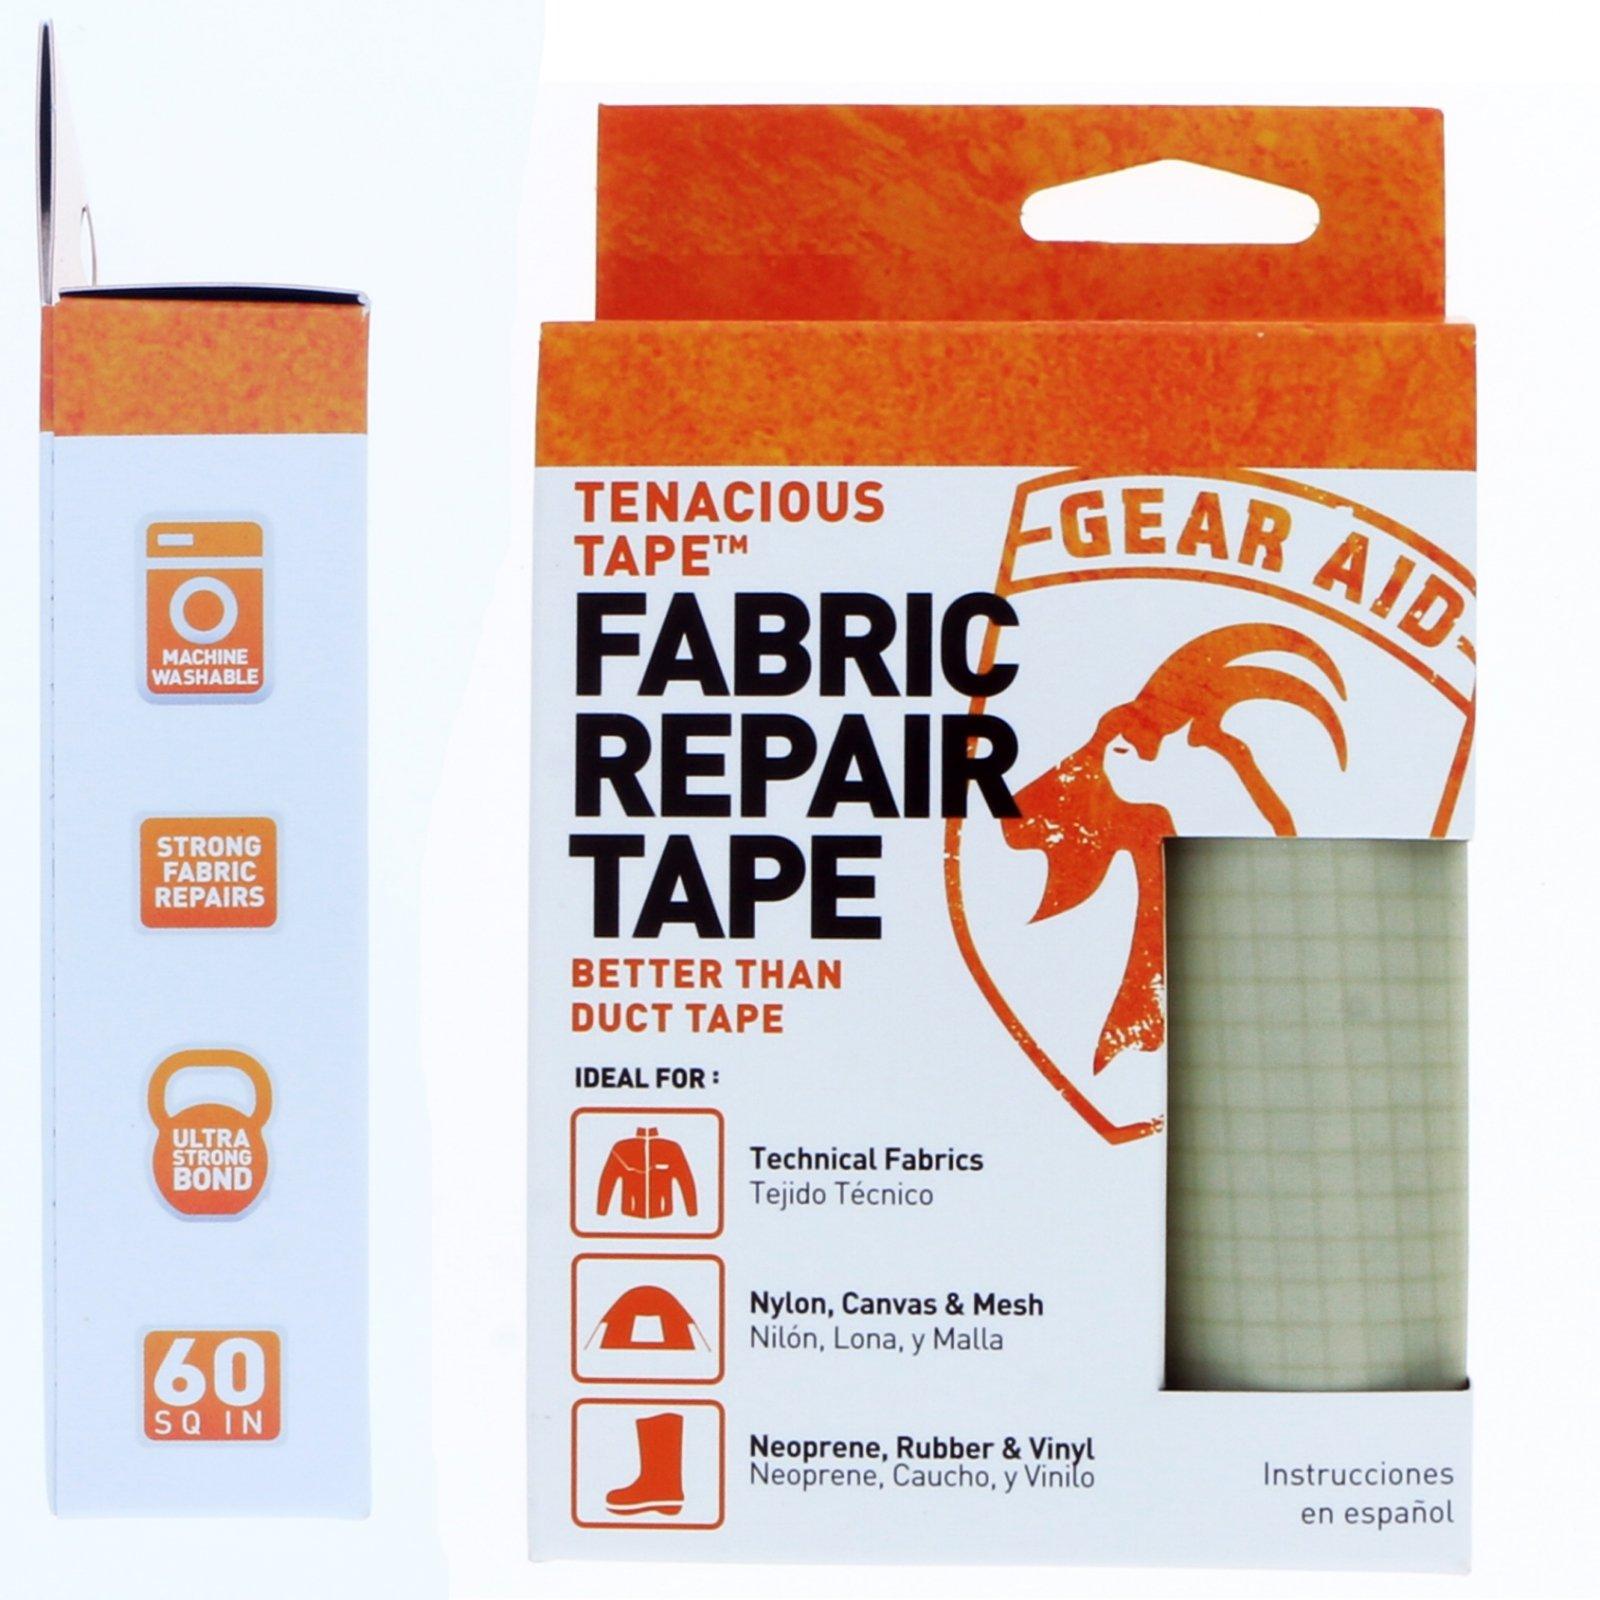 Gear Aid Tenacious Tape Ultra Strong Fabric Repair Outdoor Recreation - Platinum